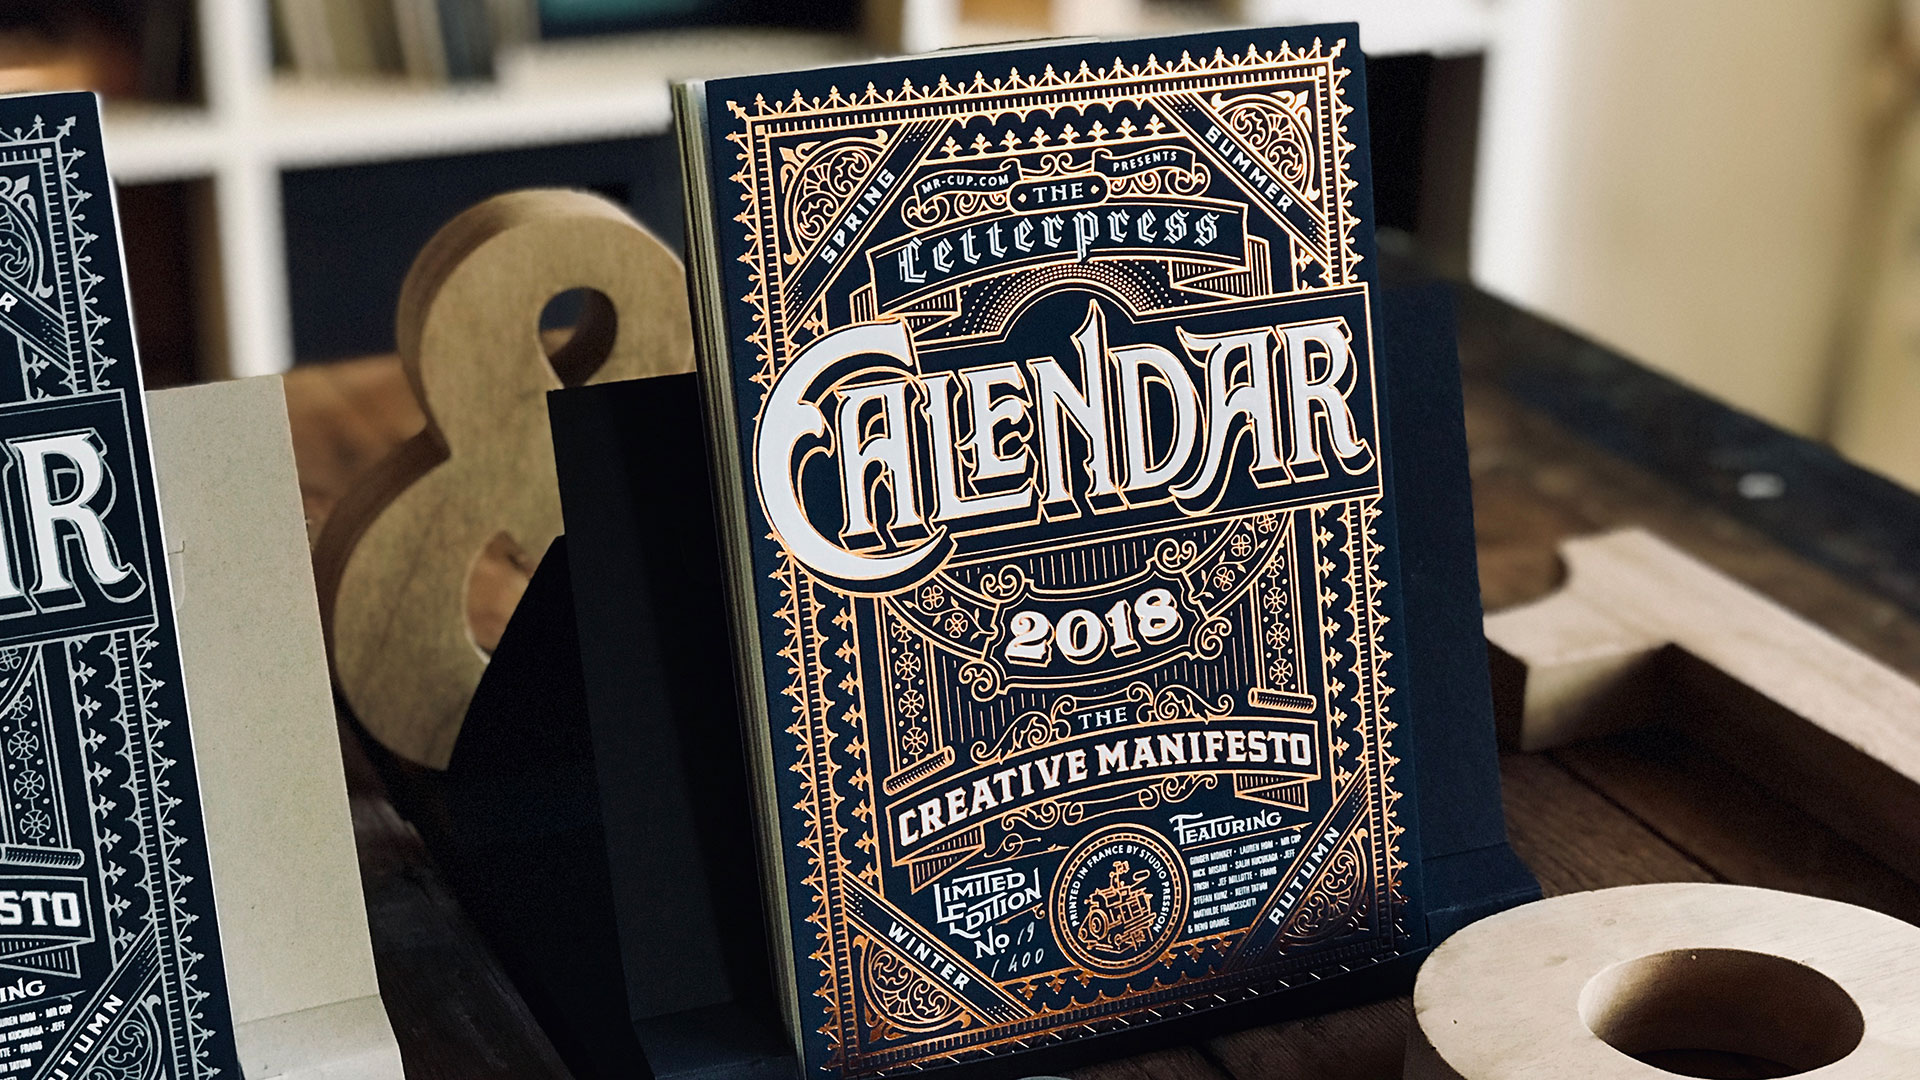 Creative Manifesto calendar - PaperSpecs